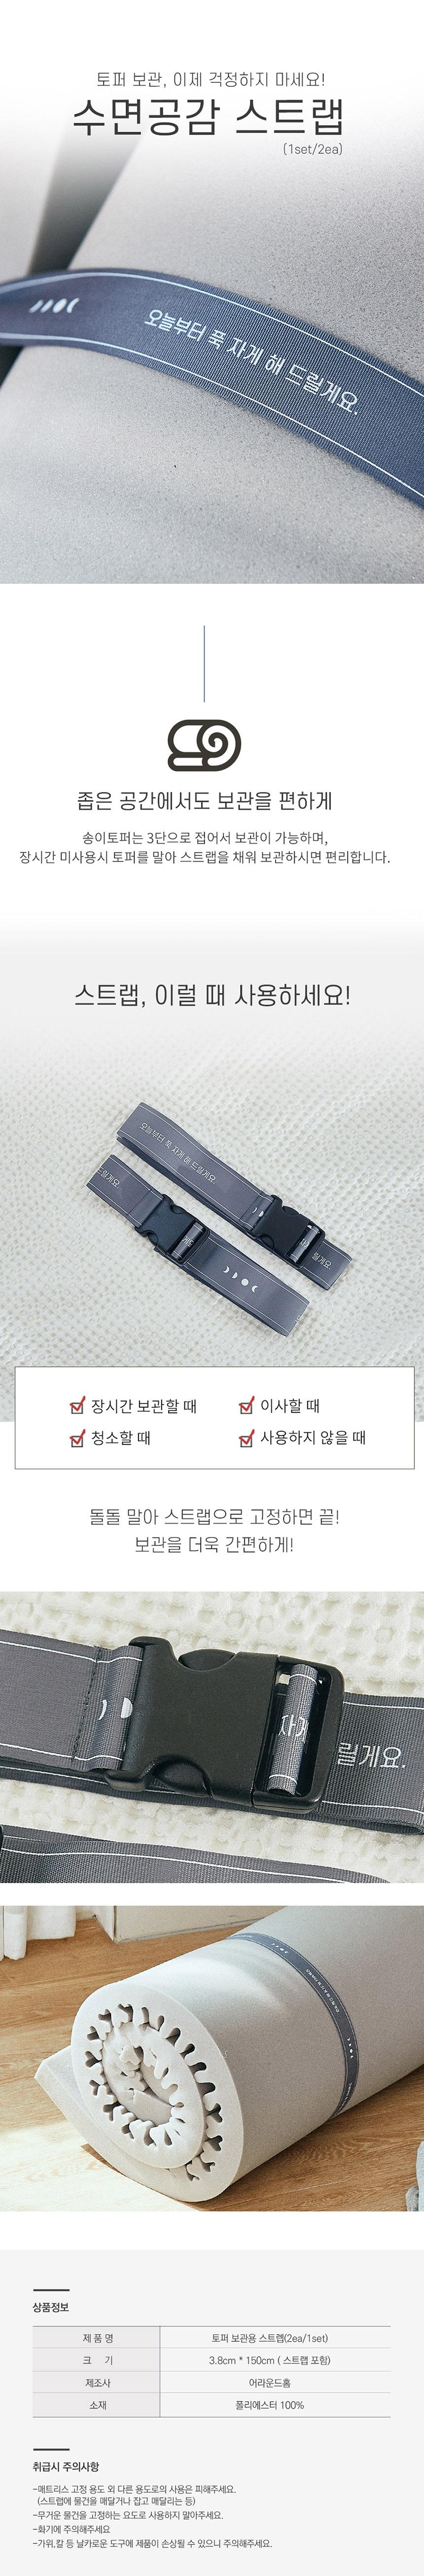 detail_strap_200512.jpg